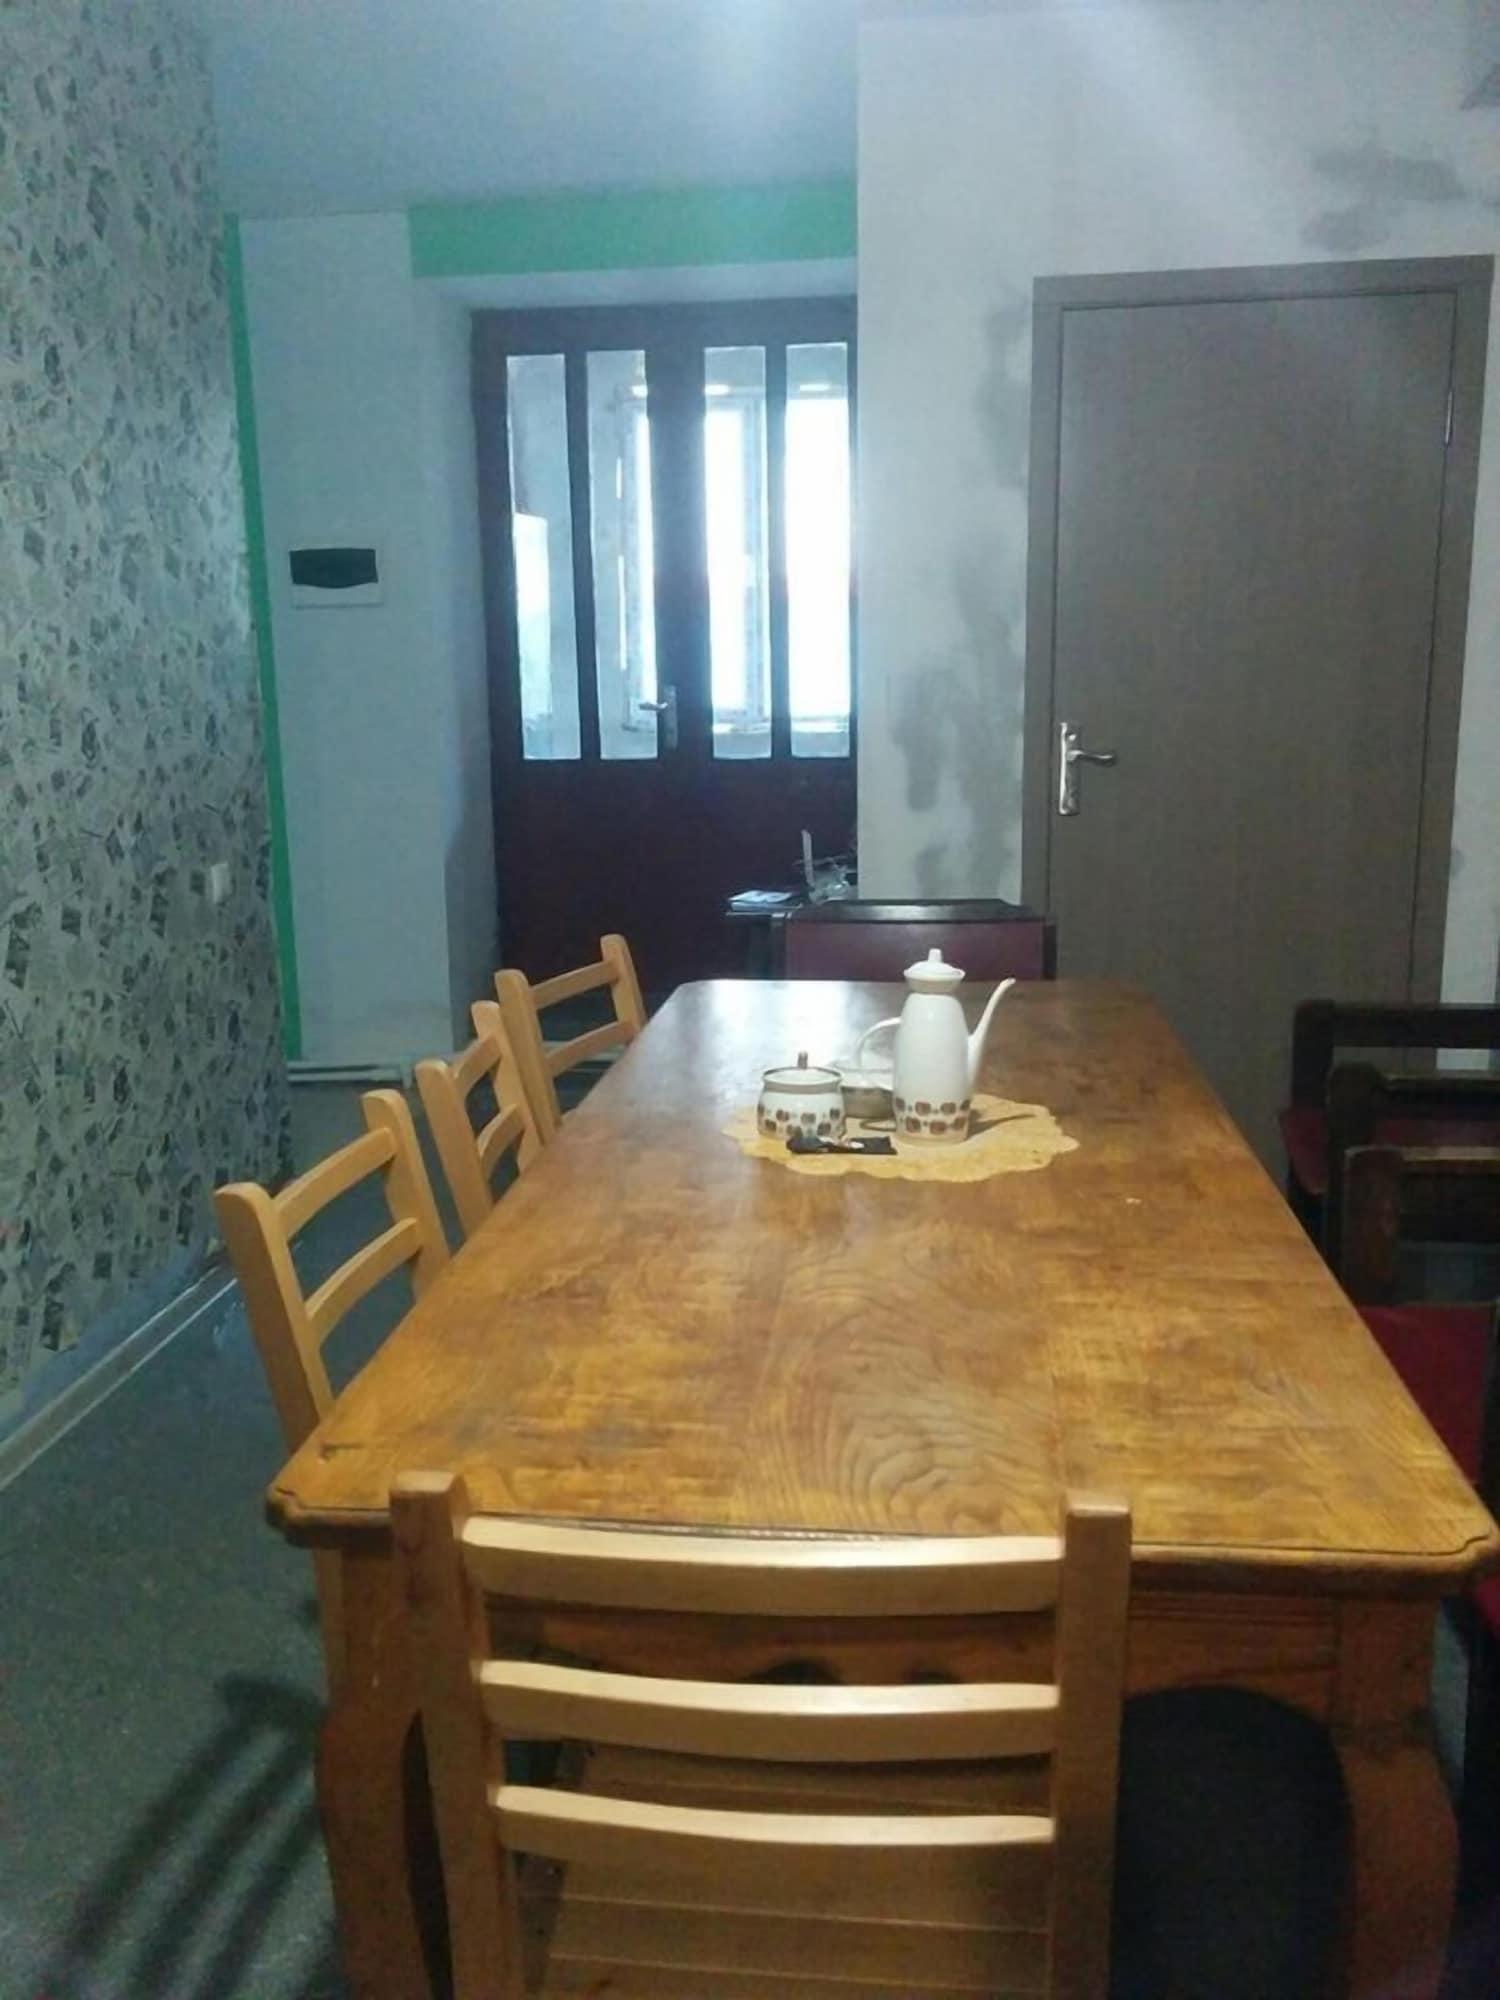 Lost inn kazbegi Hostel, Kazbegi